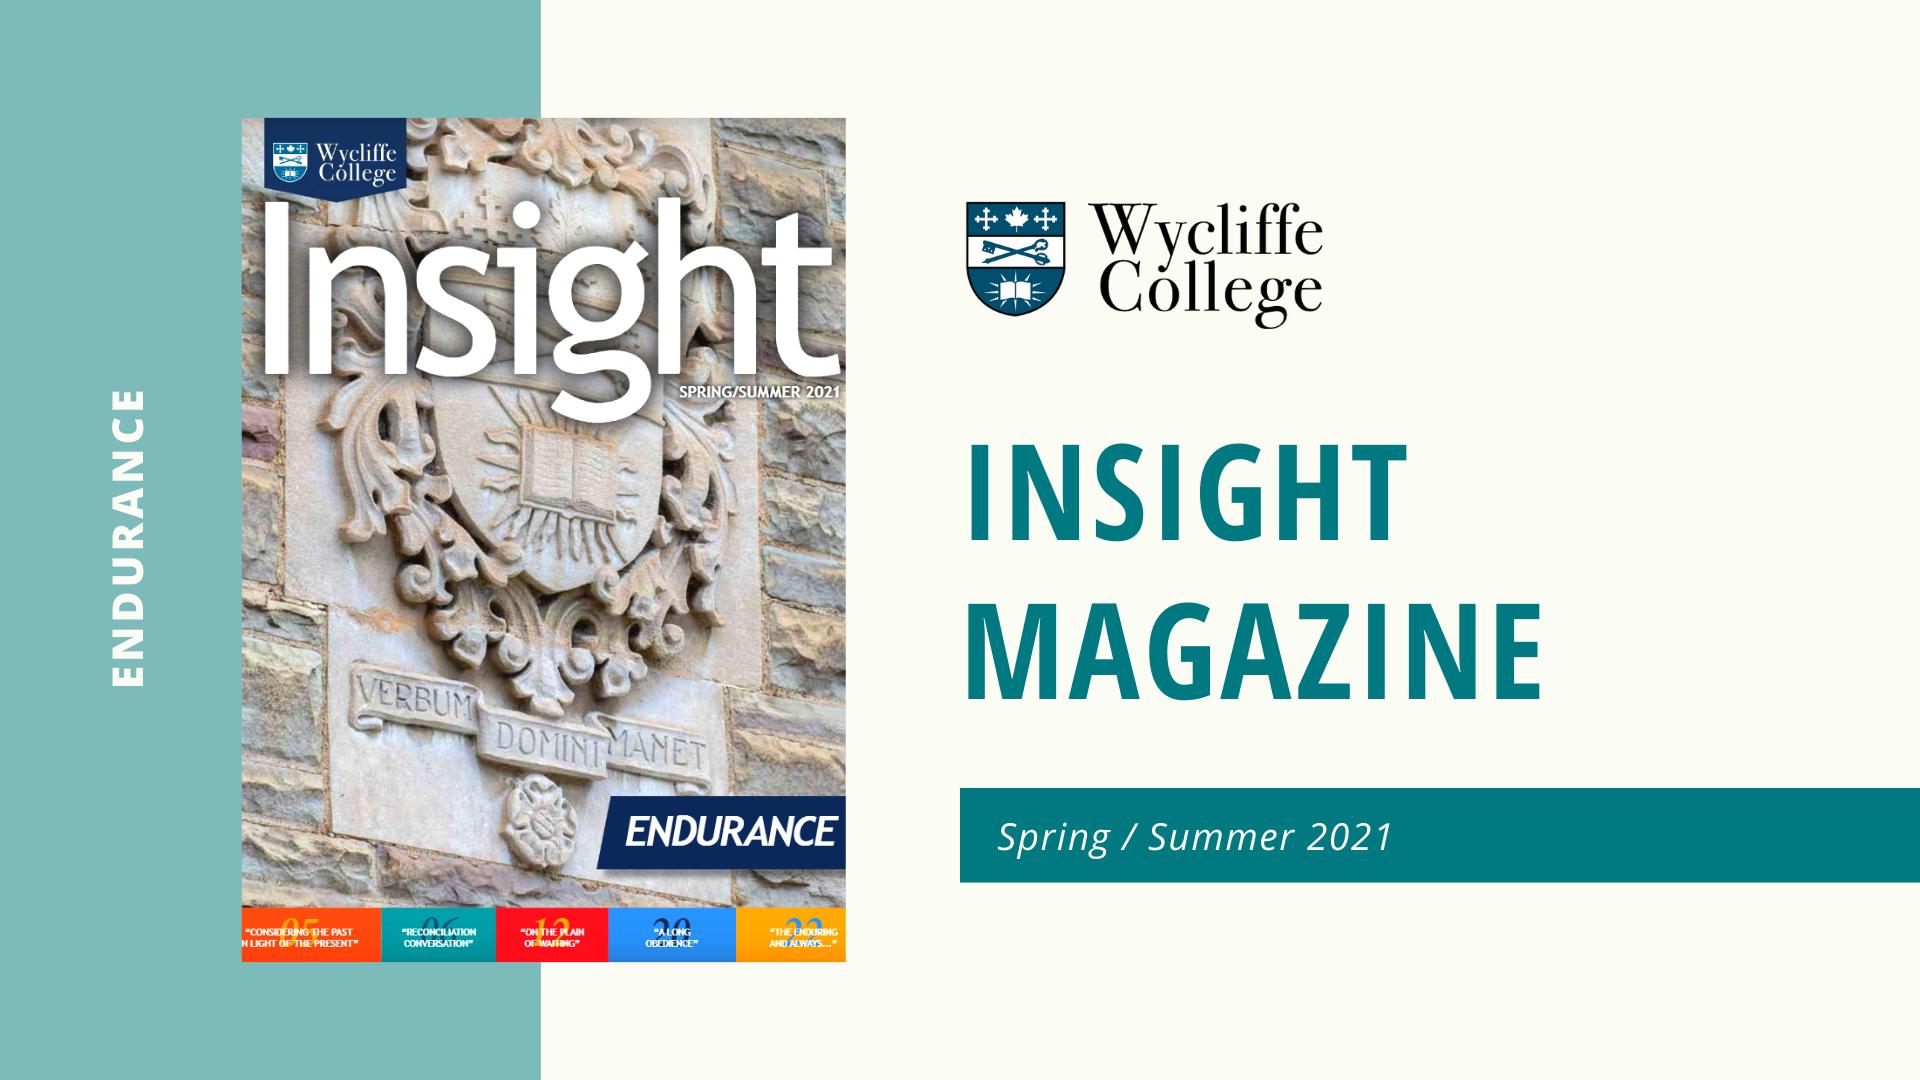 Insight Magazine - Spring/Summer 2021